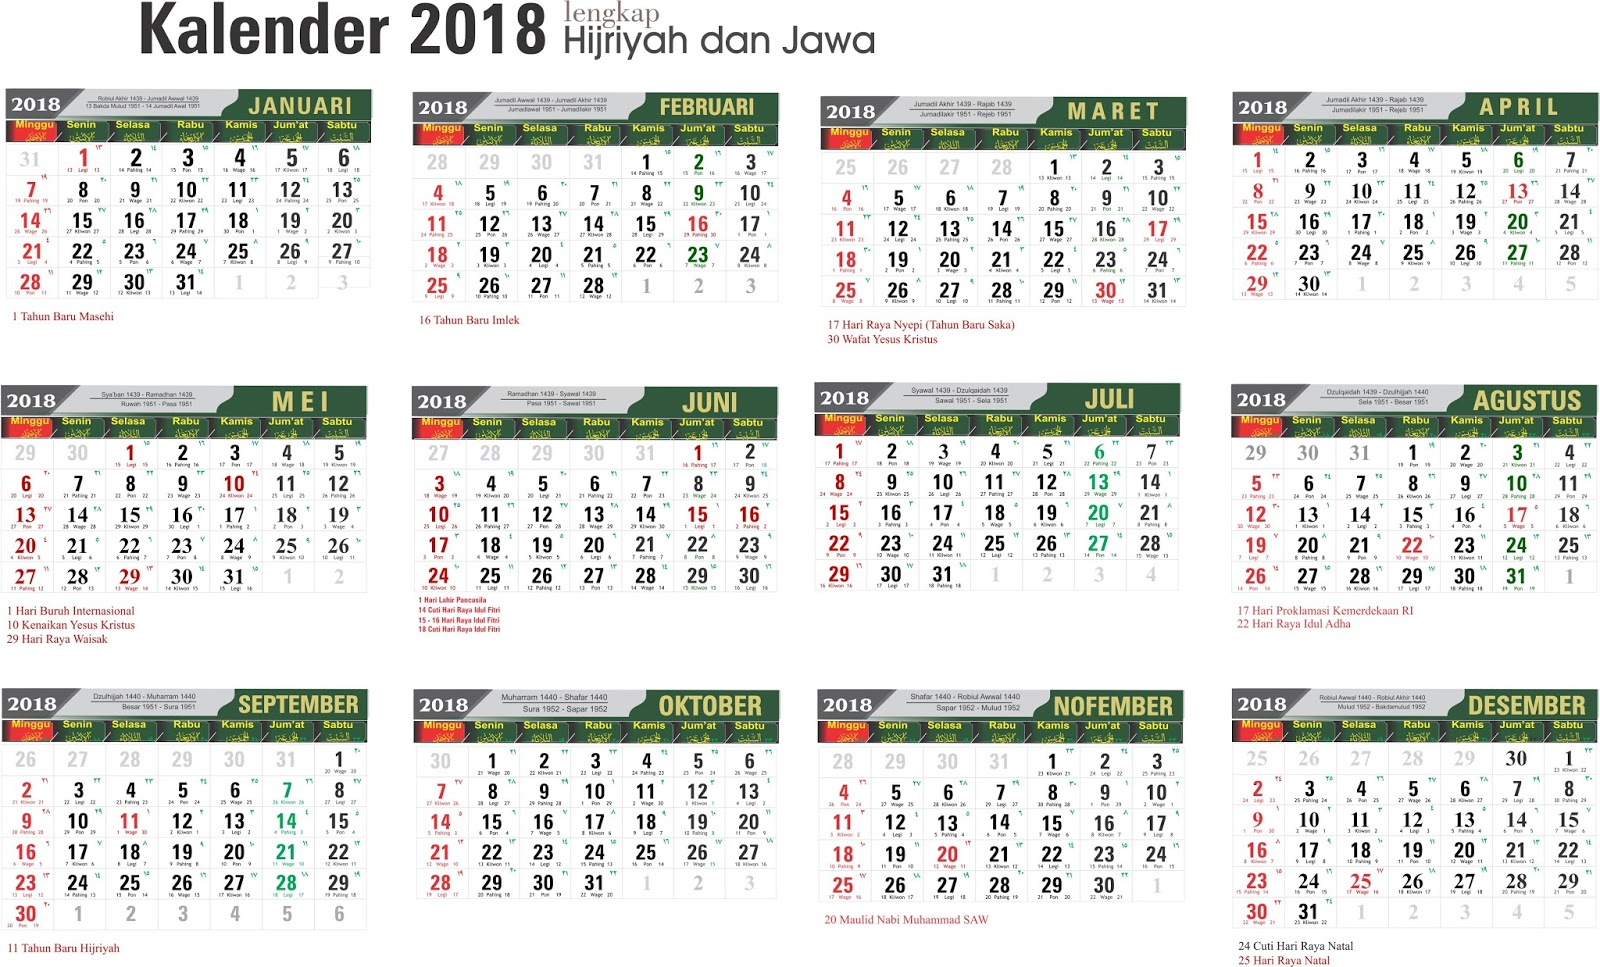 Template Kalender 2018 Lengkap Hijriyah Dan Jawa GRATIS ...